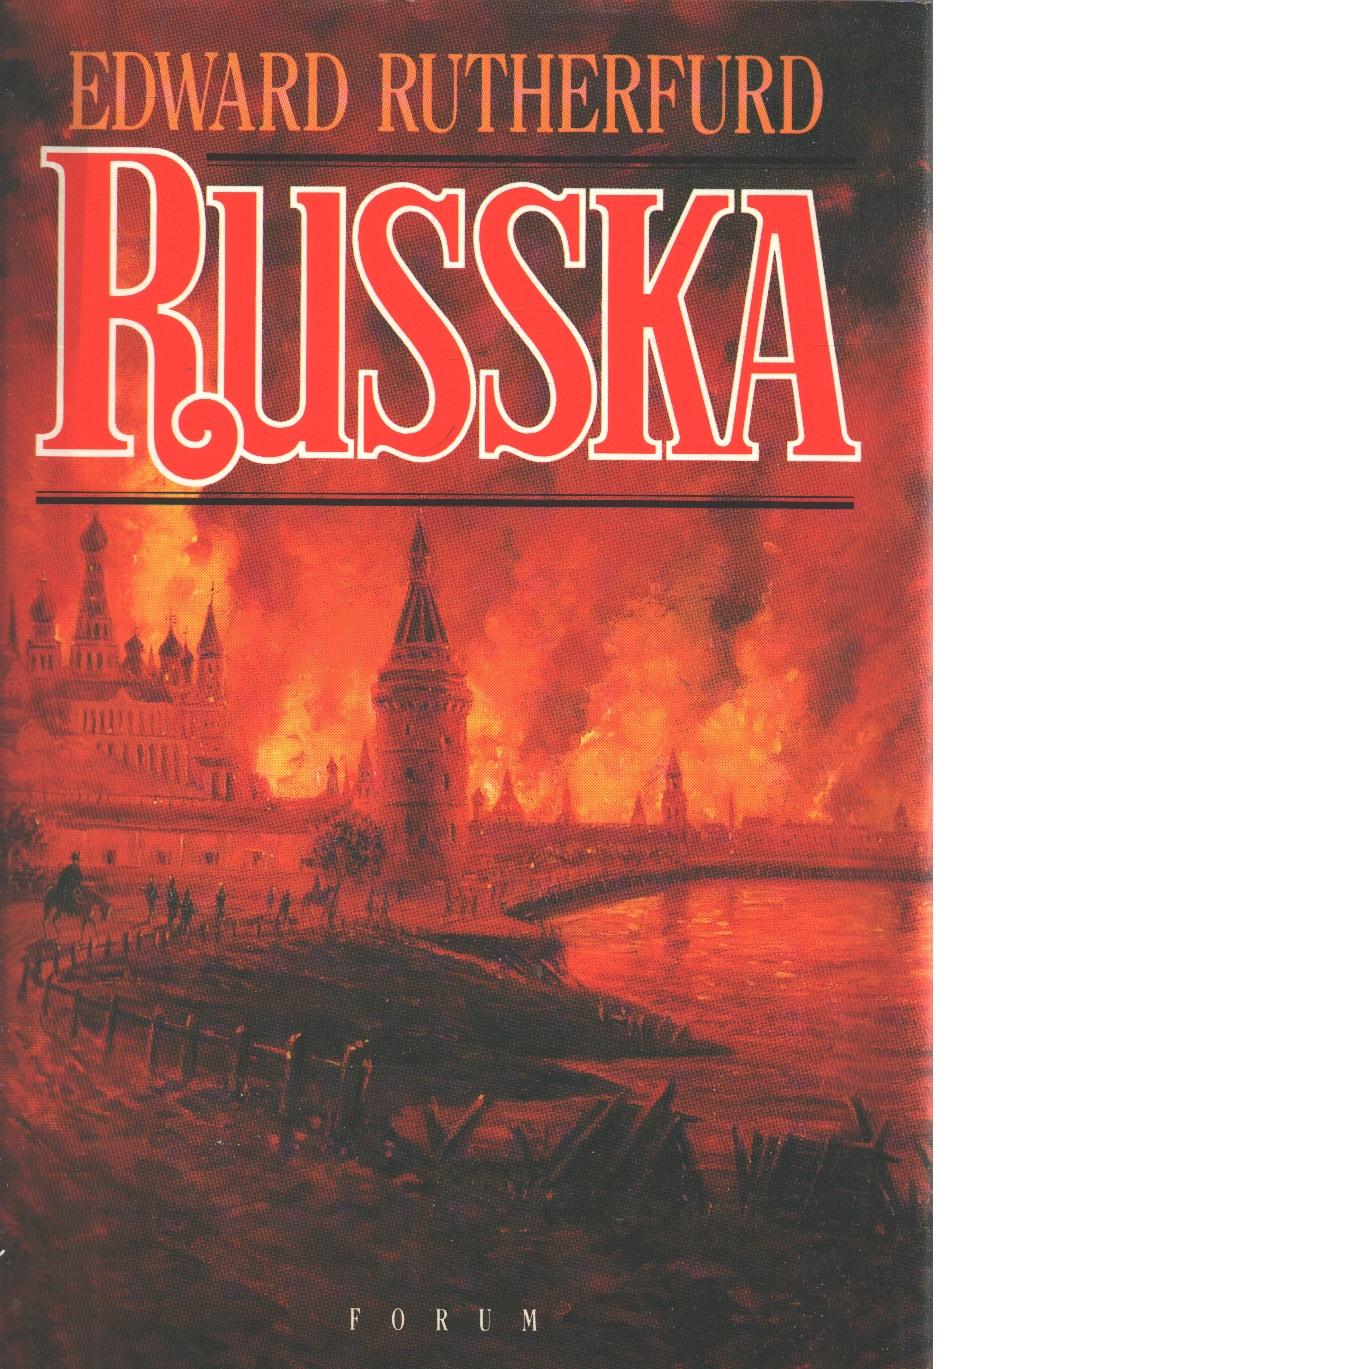 Russka - Rutherfurd, Edward